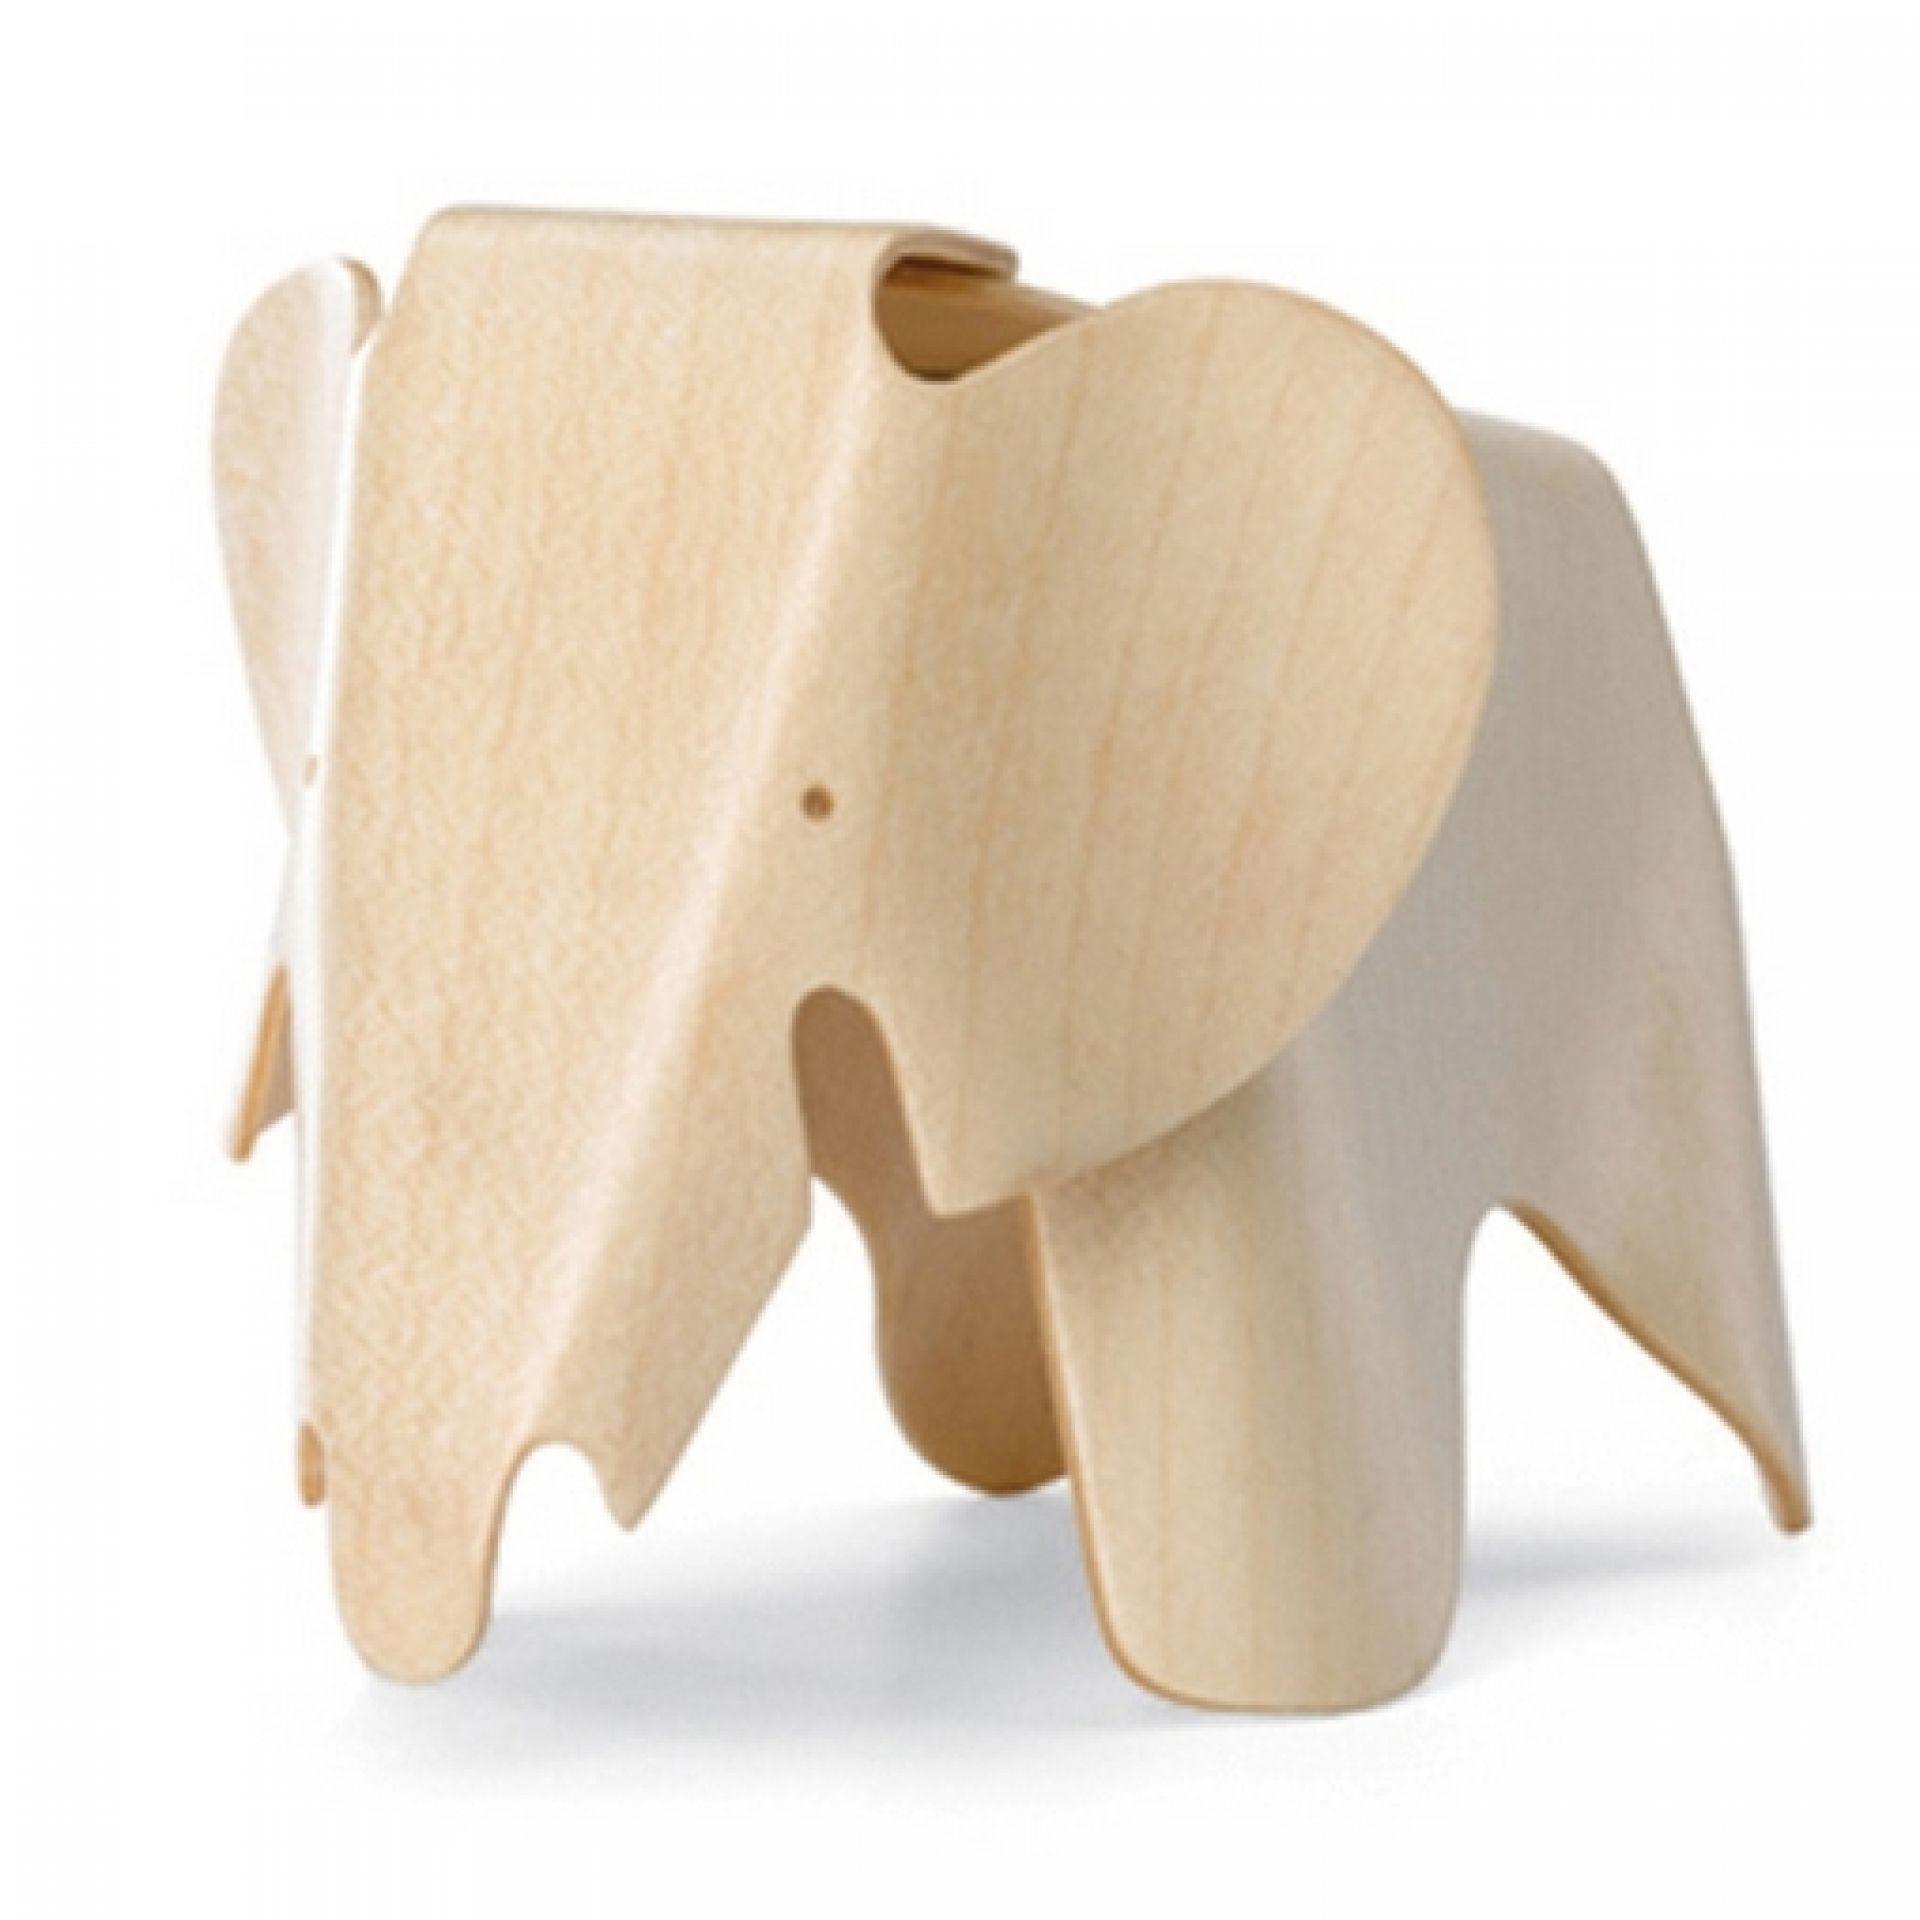 Plywood Elephant miniature Vitra